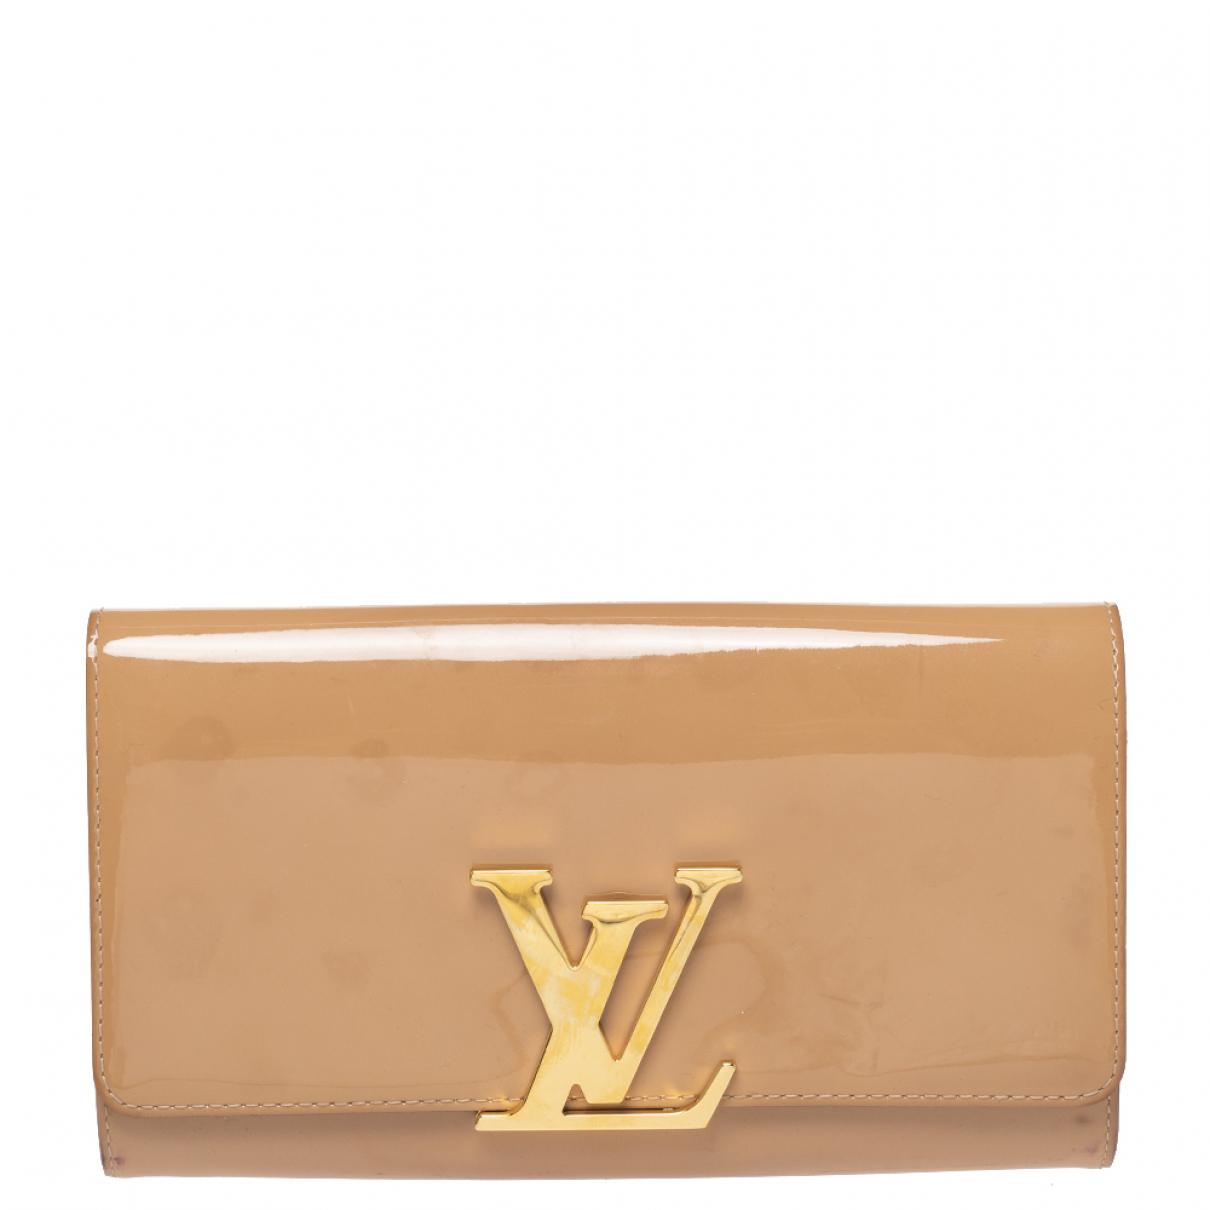 Louis Vuitton N Beige Leather Clutch bag for Women N